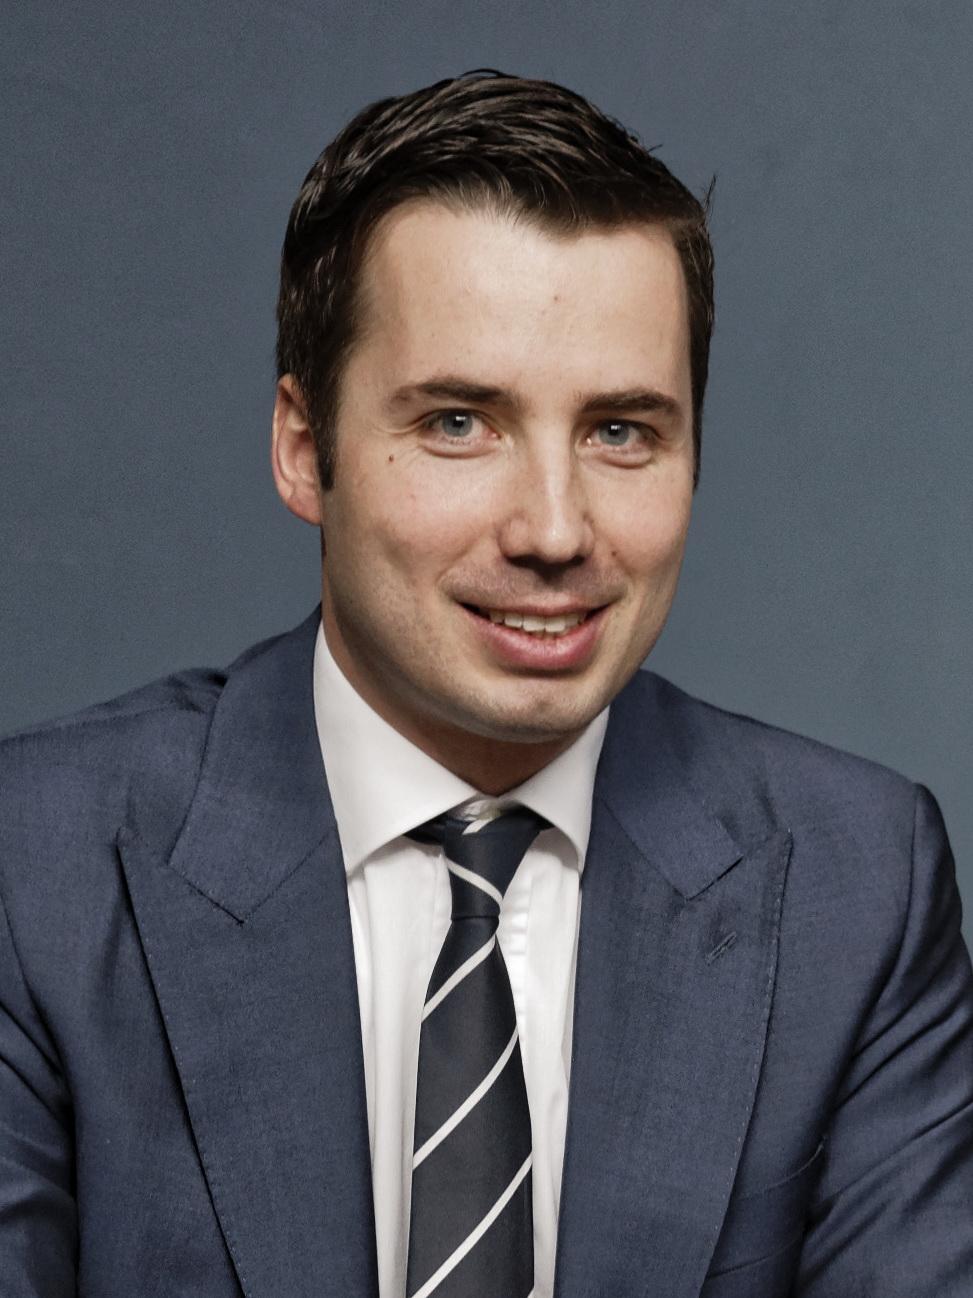 Michal Pisoja